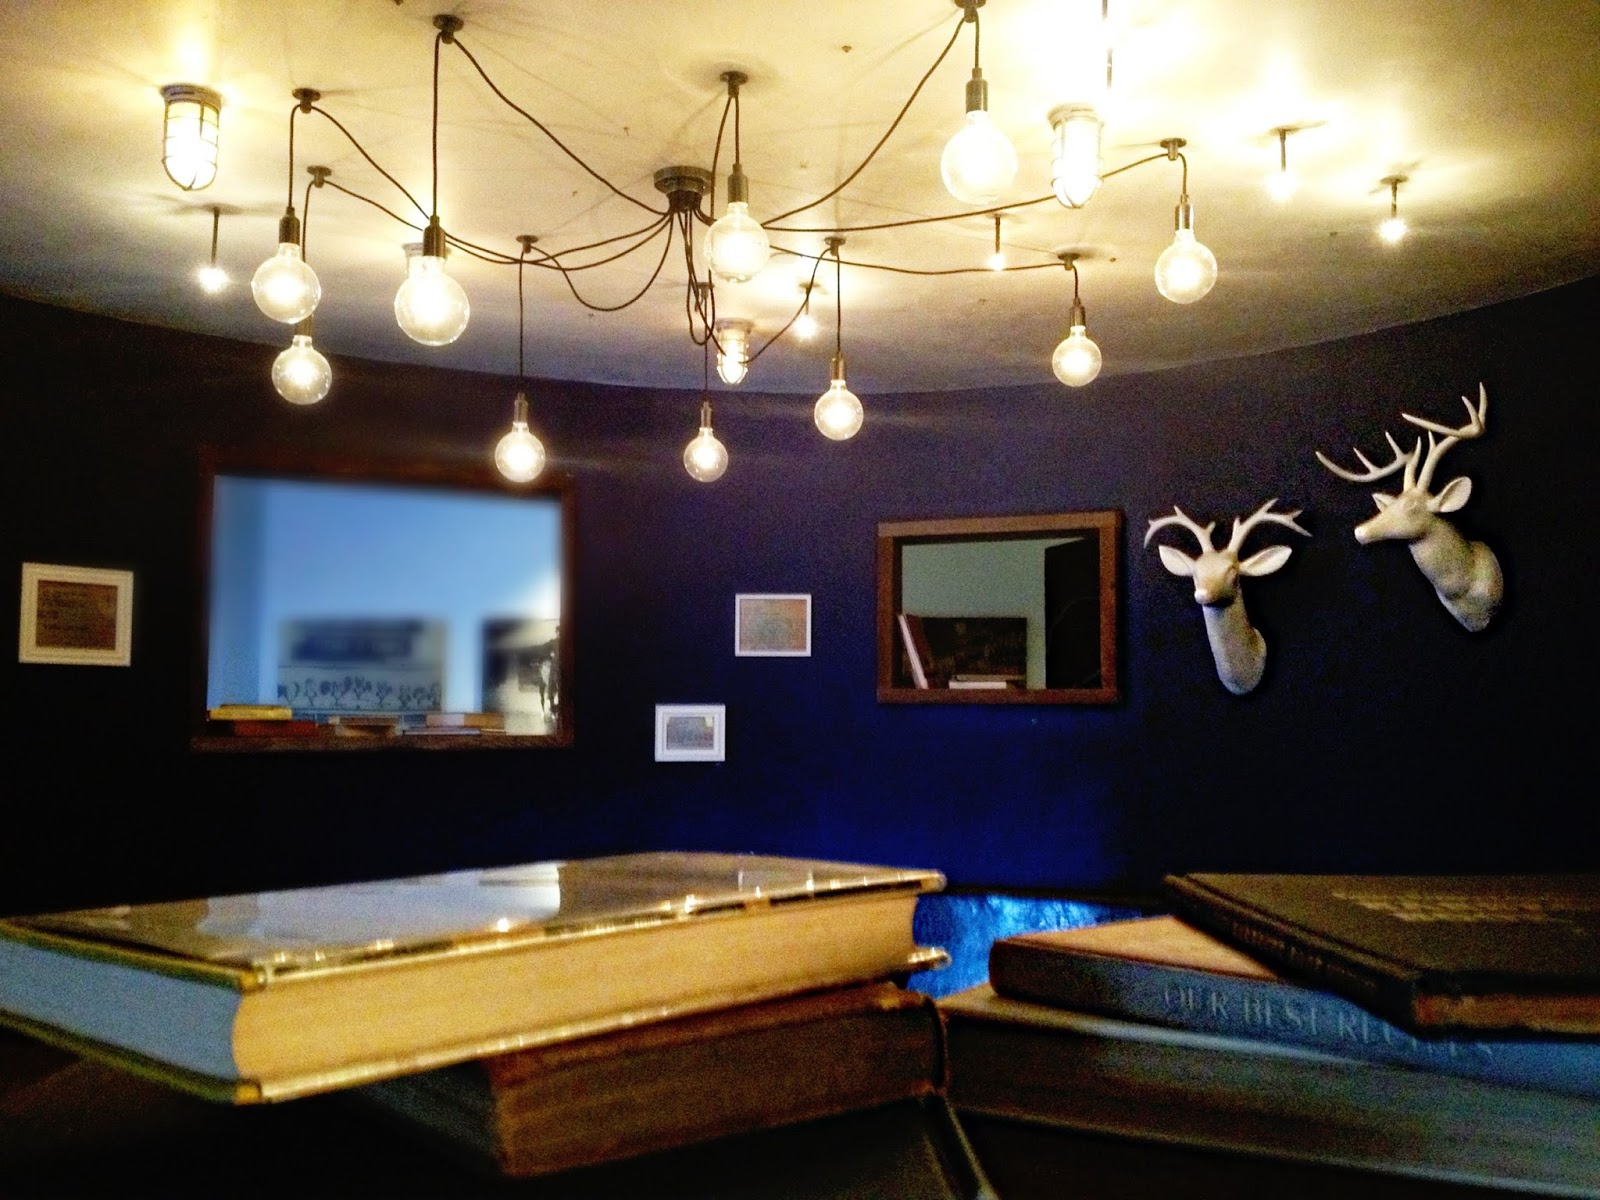 Blue Cow Kitchen And Bar Vixens La Happy Hours August 2013